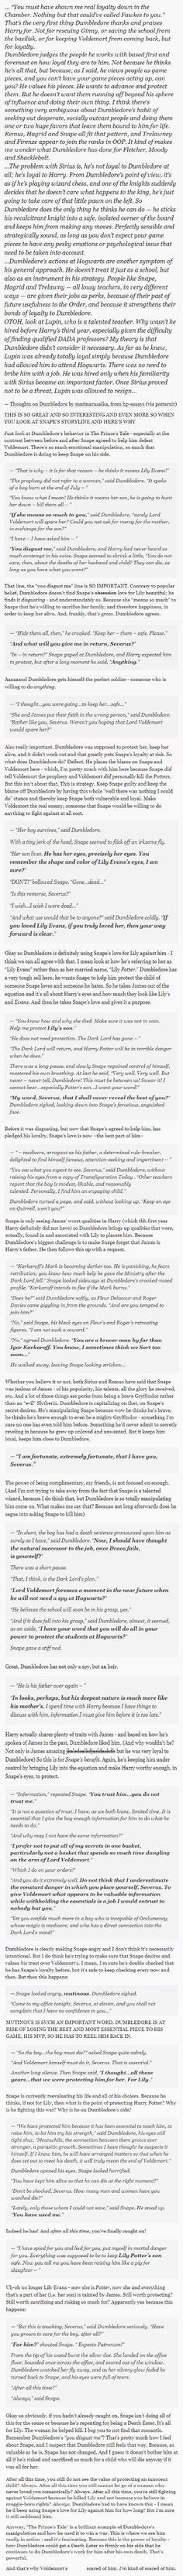 Dumbledore is devious.